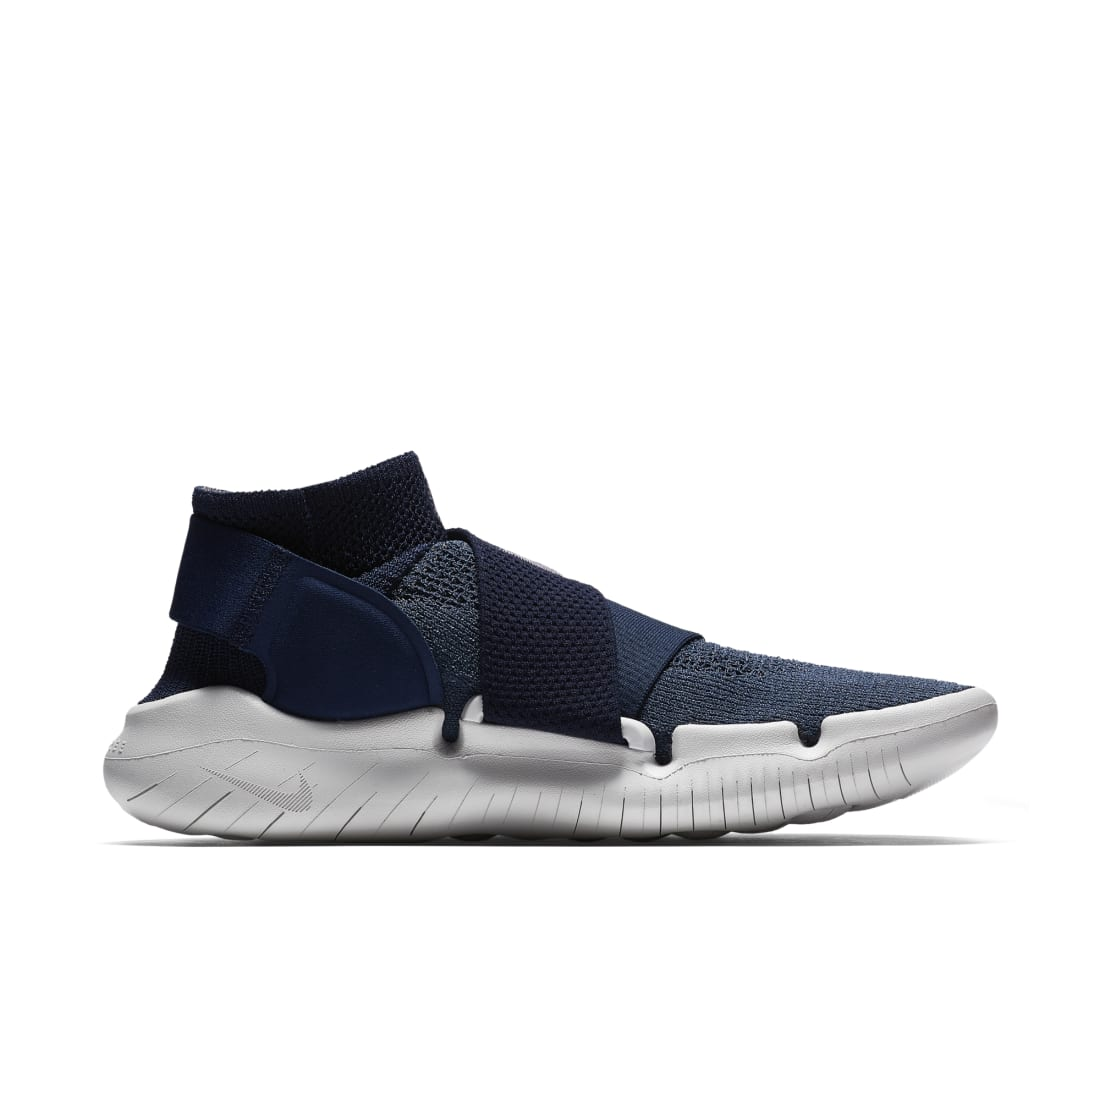 Nike Free RN Flyknit 2018 Squadron Blue